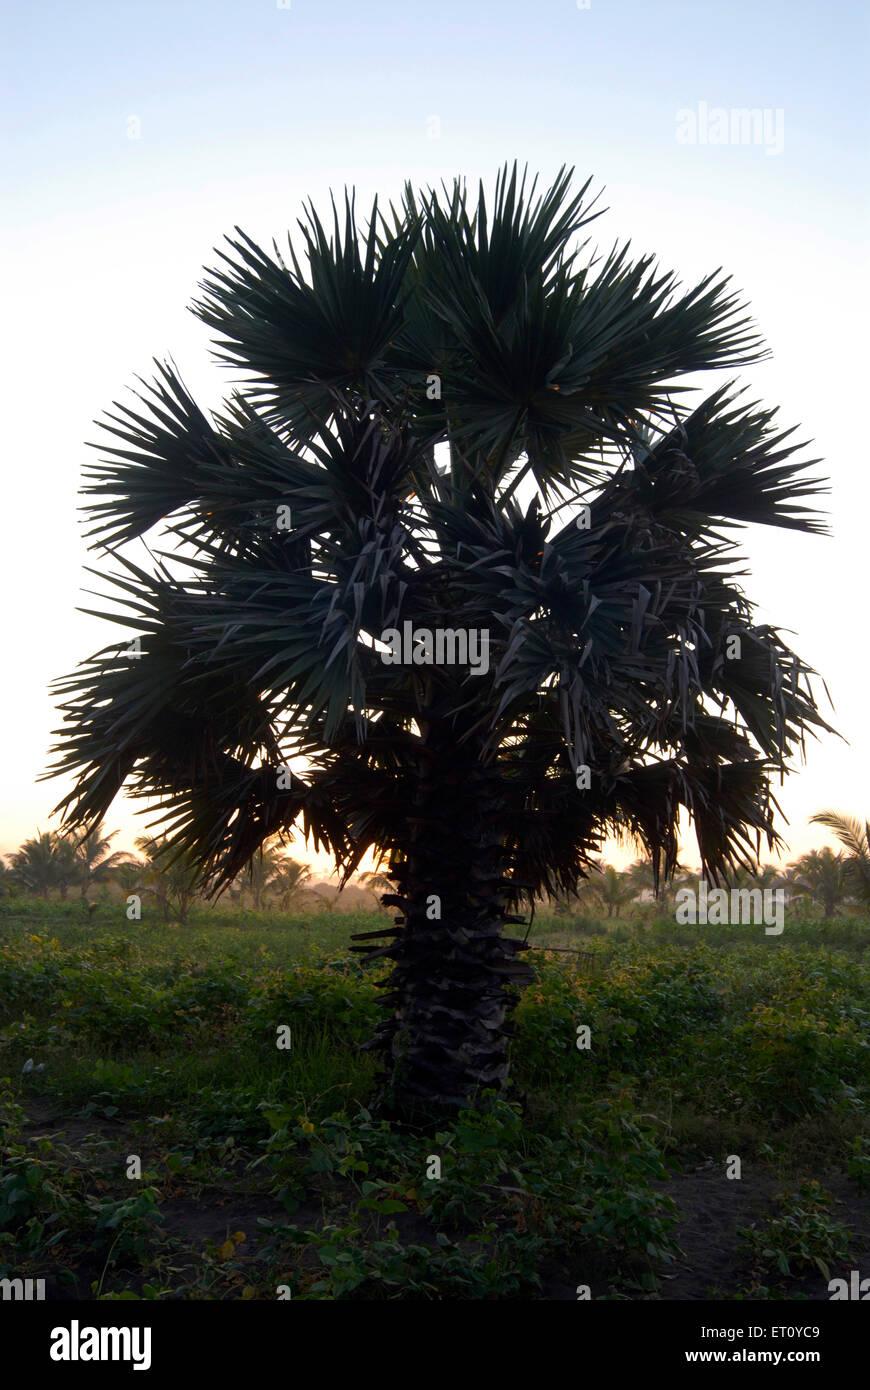 Palmyra palm silhouette sunrise at Kalamb beach ; Bassein Vasai ; District Thane ; Maharashtra ; India - Stock Image